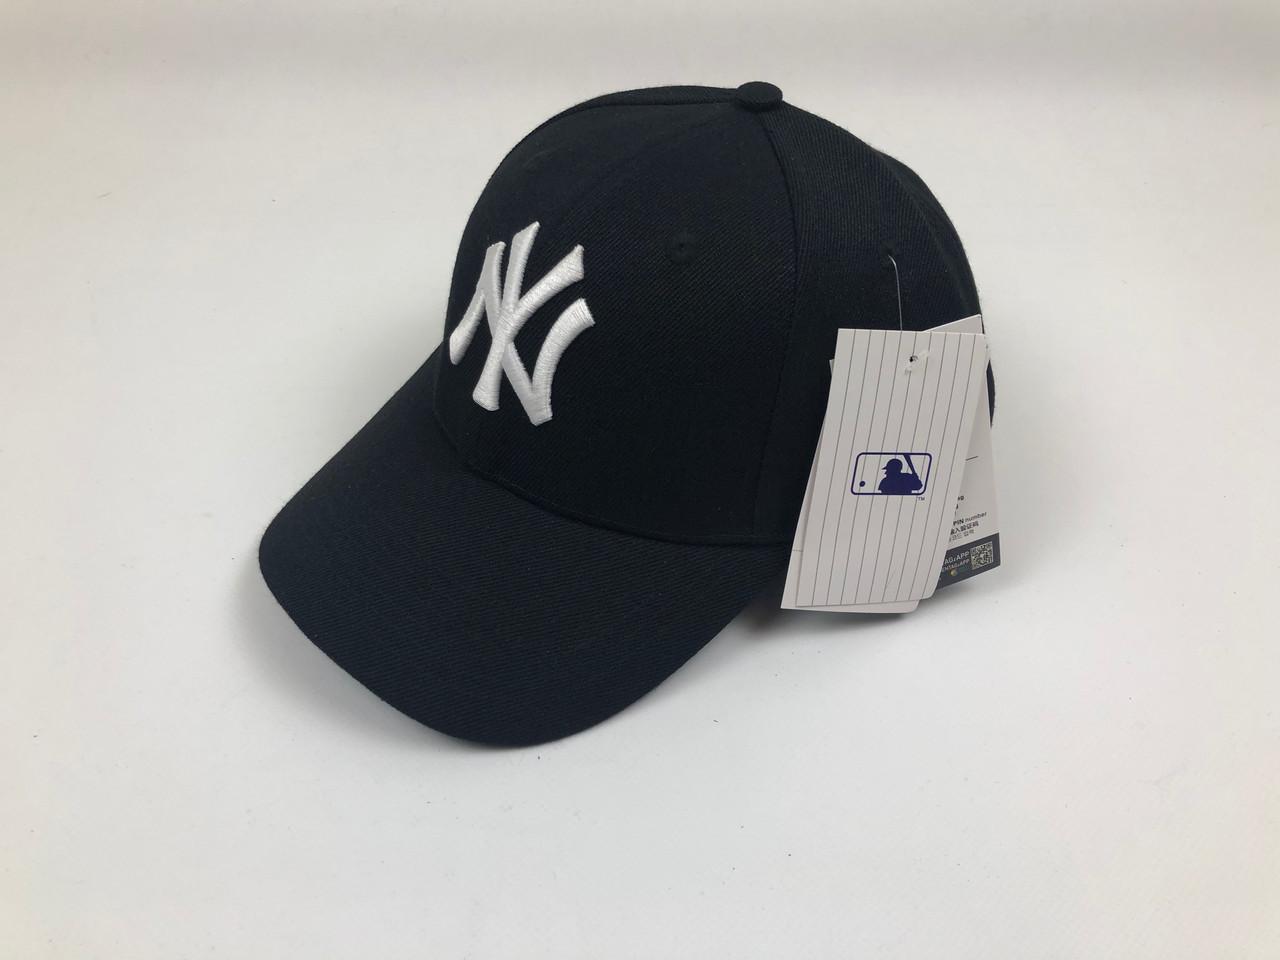 Кепка Бейсболка Мужская Женская MLB New York Yankees NY Черная с Белым лого